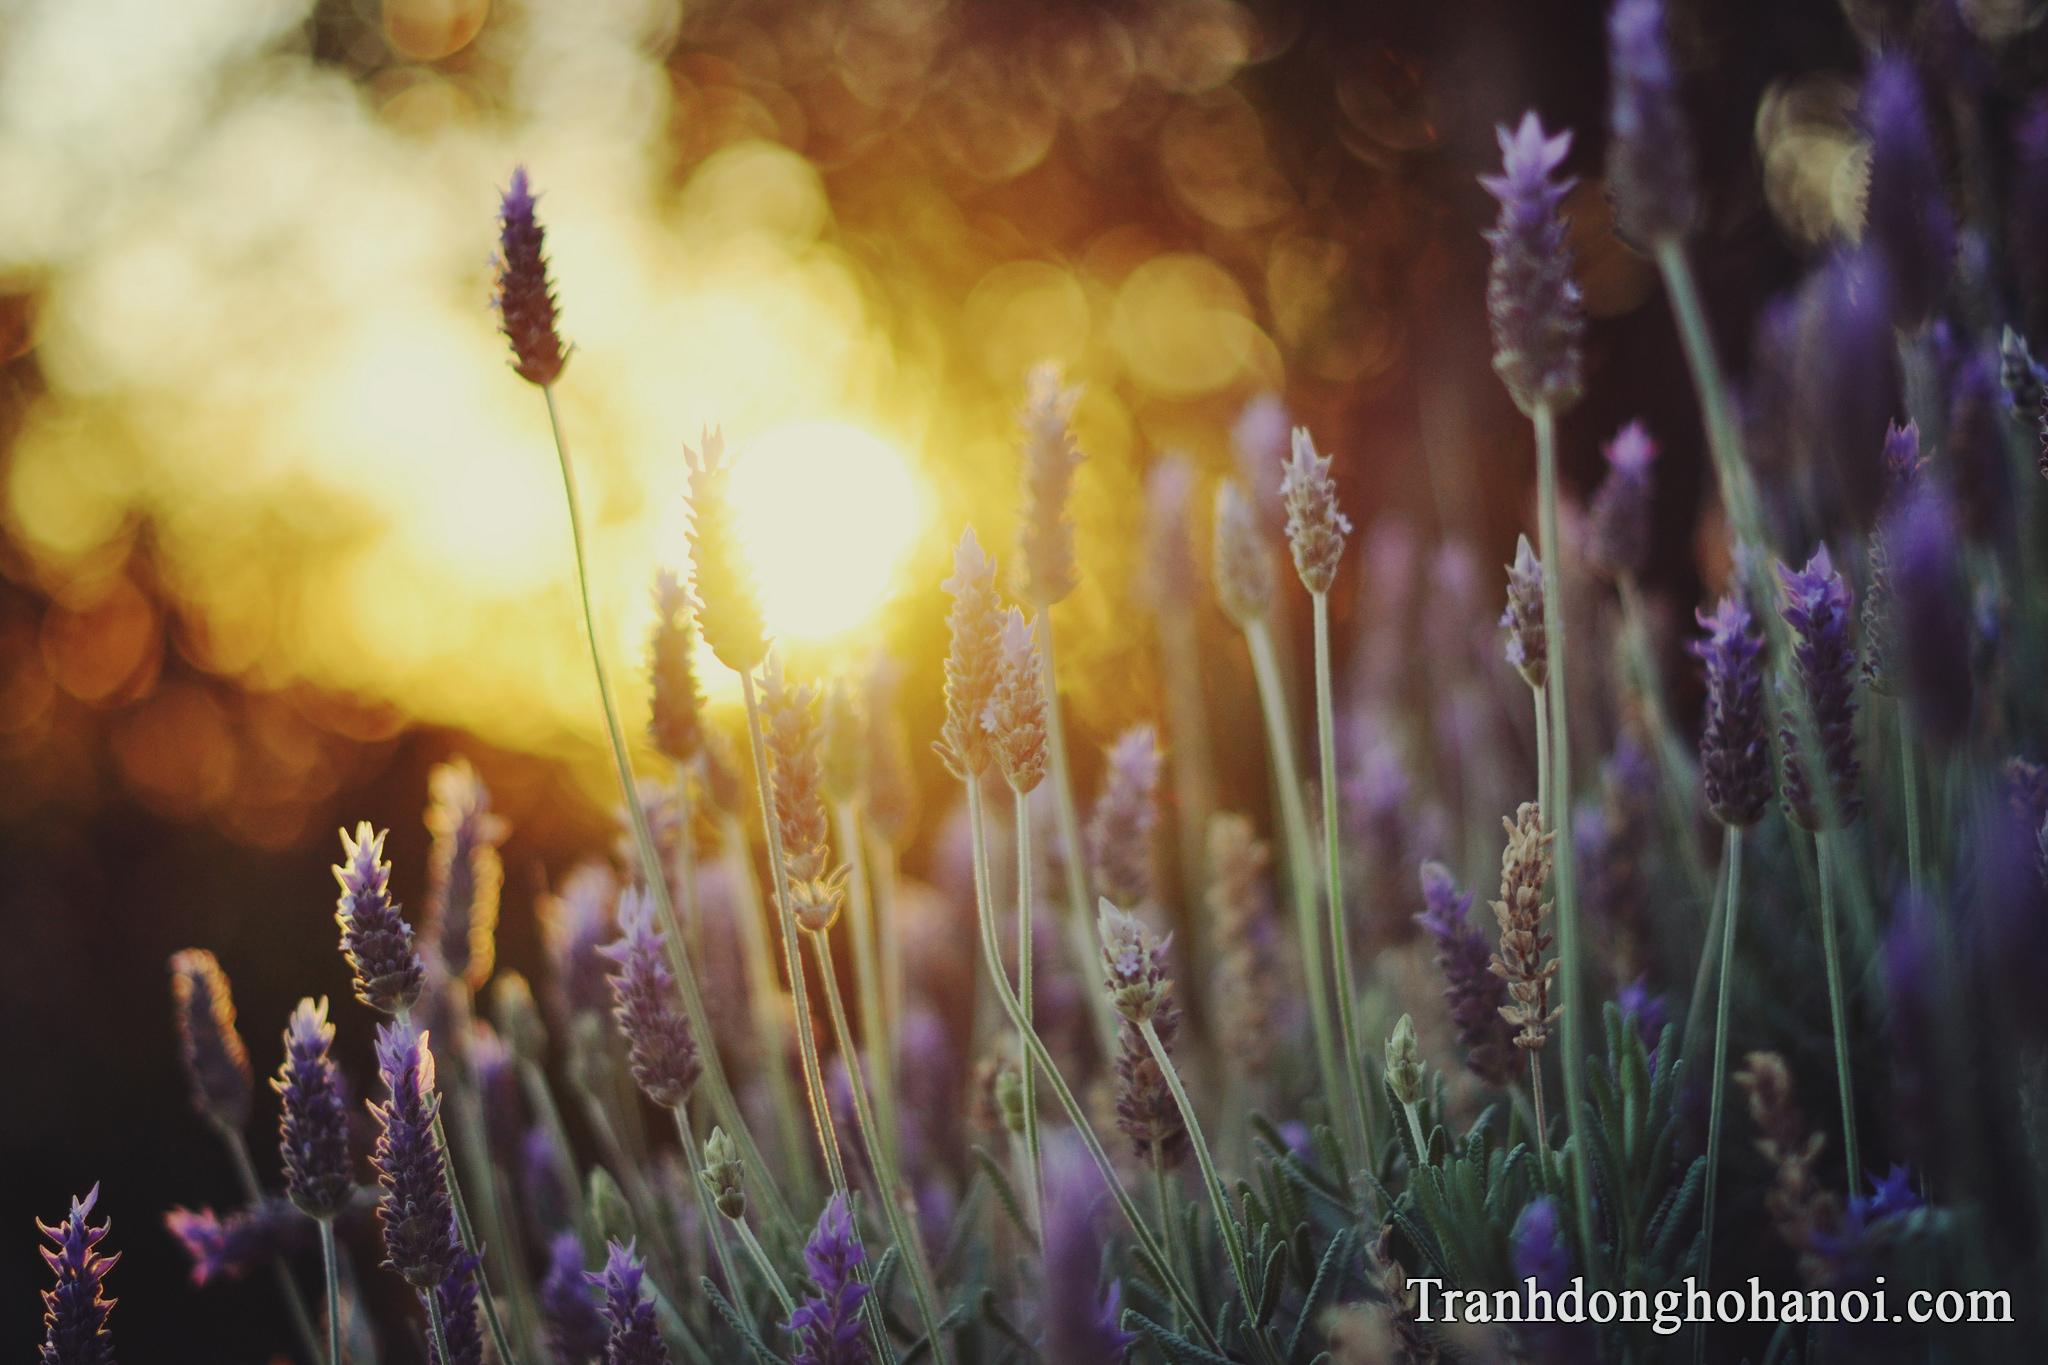 Hinh anh hoa lavender oai huong lung linh trong nang chieu